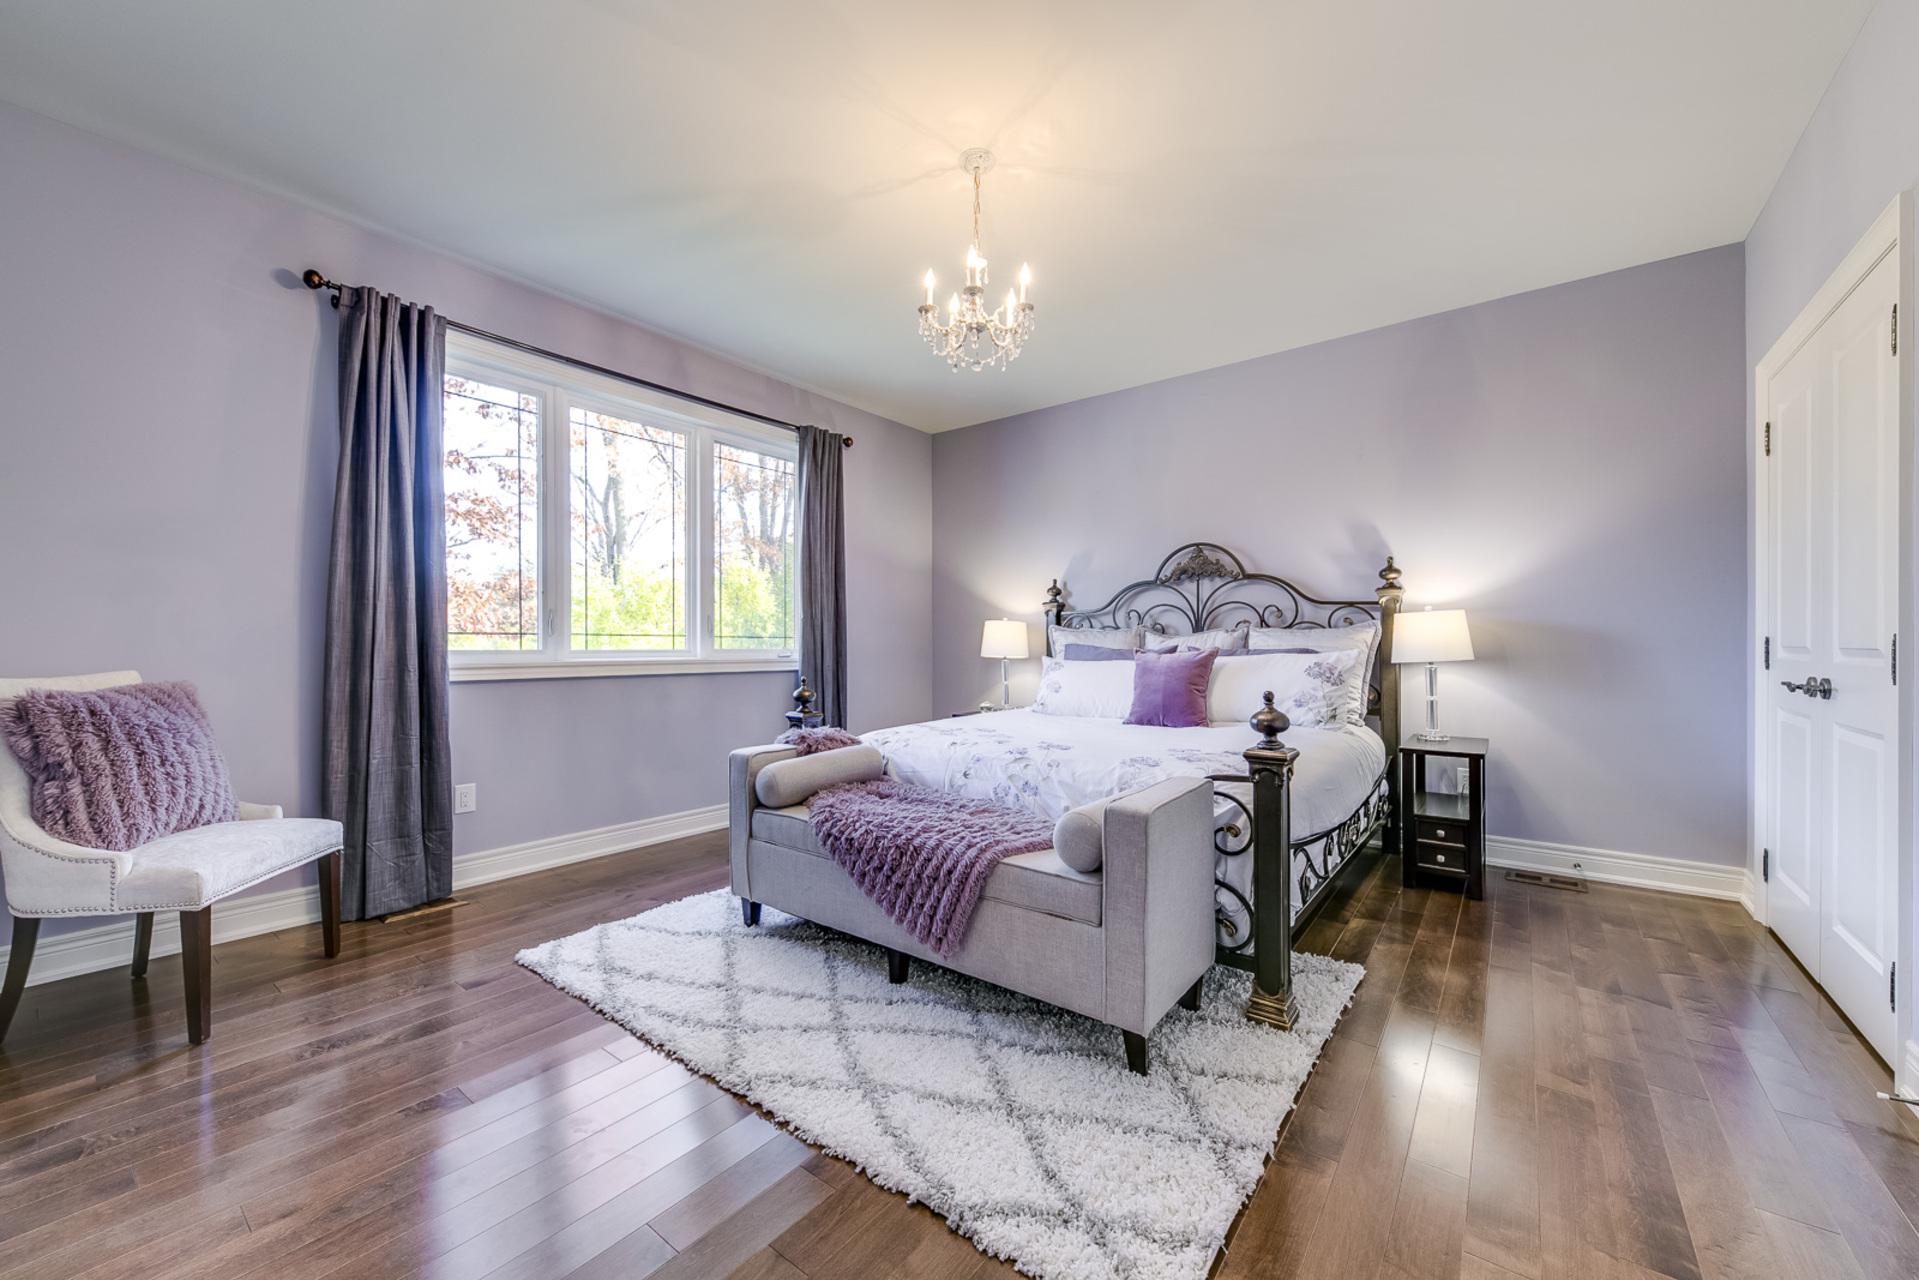 3rd Bedroom - 5041 Lakeshore Rd, Burlington - Elite3 & Team at 5041 Lakeshore Road, Appleby, Burlington